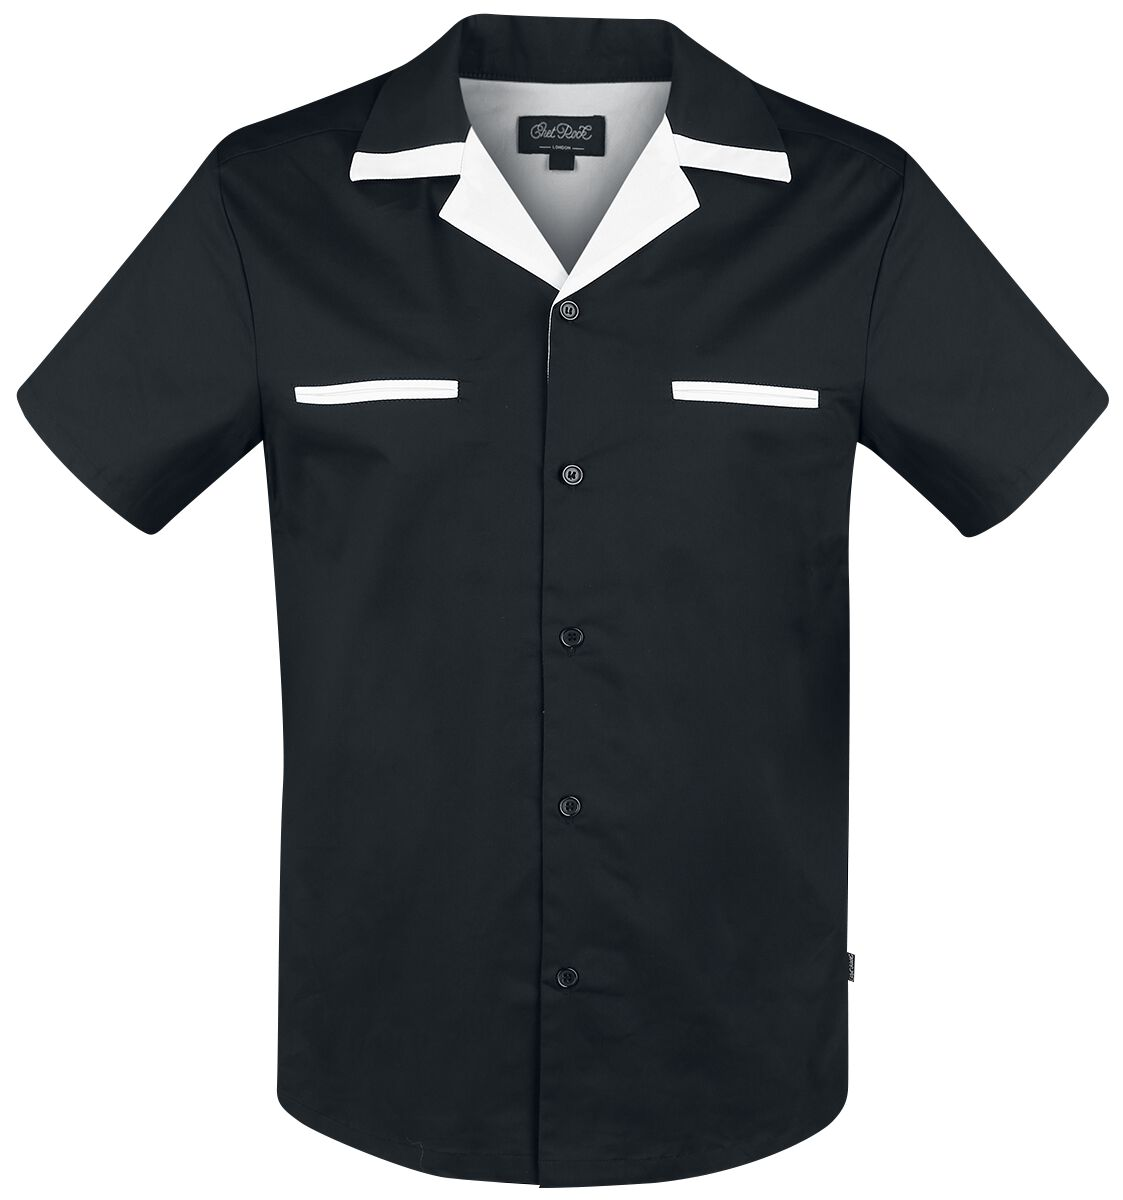 Chet Rock  Donnie Bowling Shirt  Hemd  schwarz